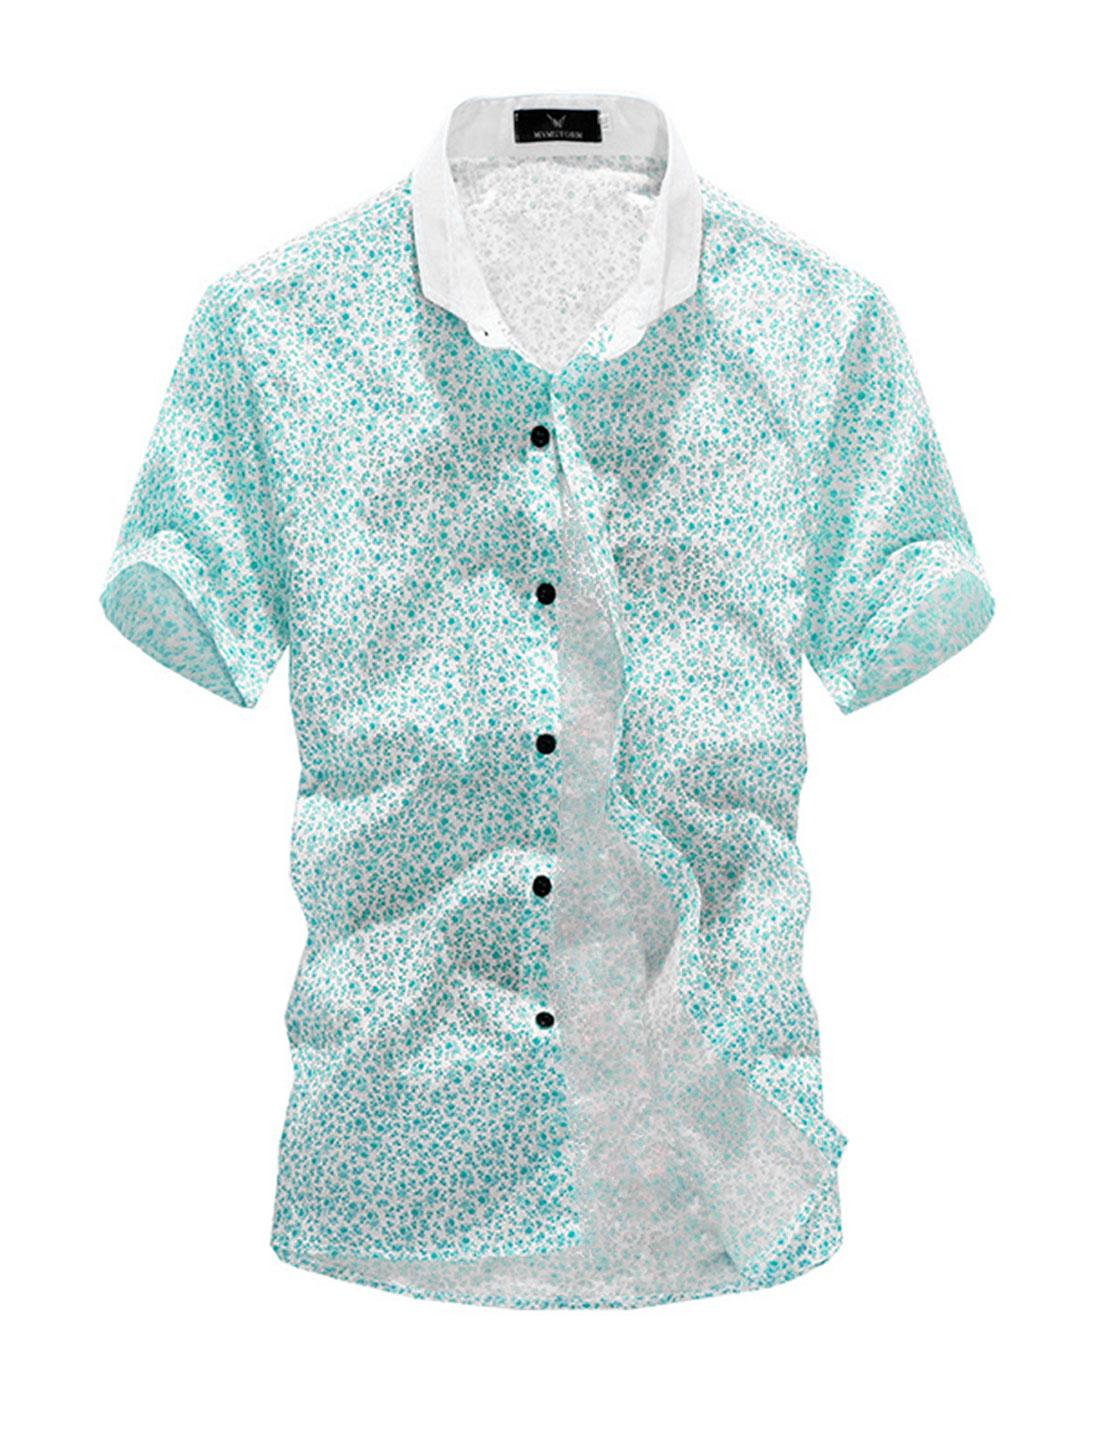 Buttons Closure Short Sleeve Trendy Floral Shirt for Men Aqua White M